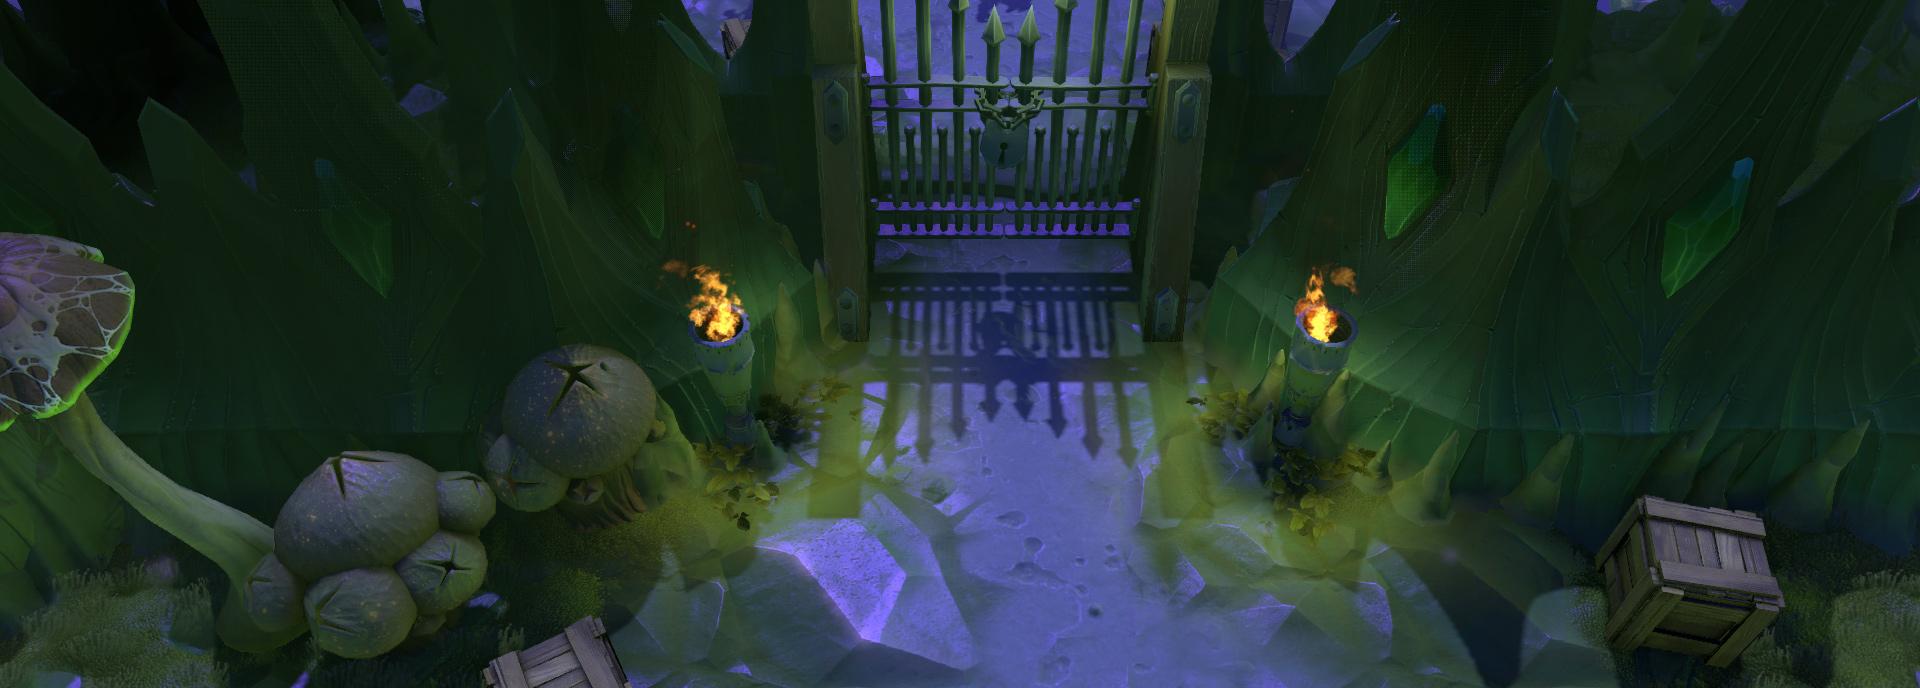 The Underhollow Preview 06.jpg